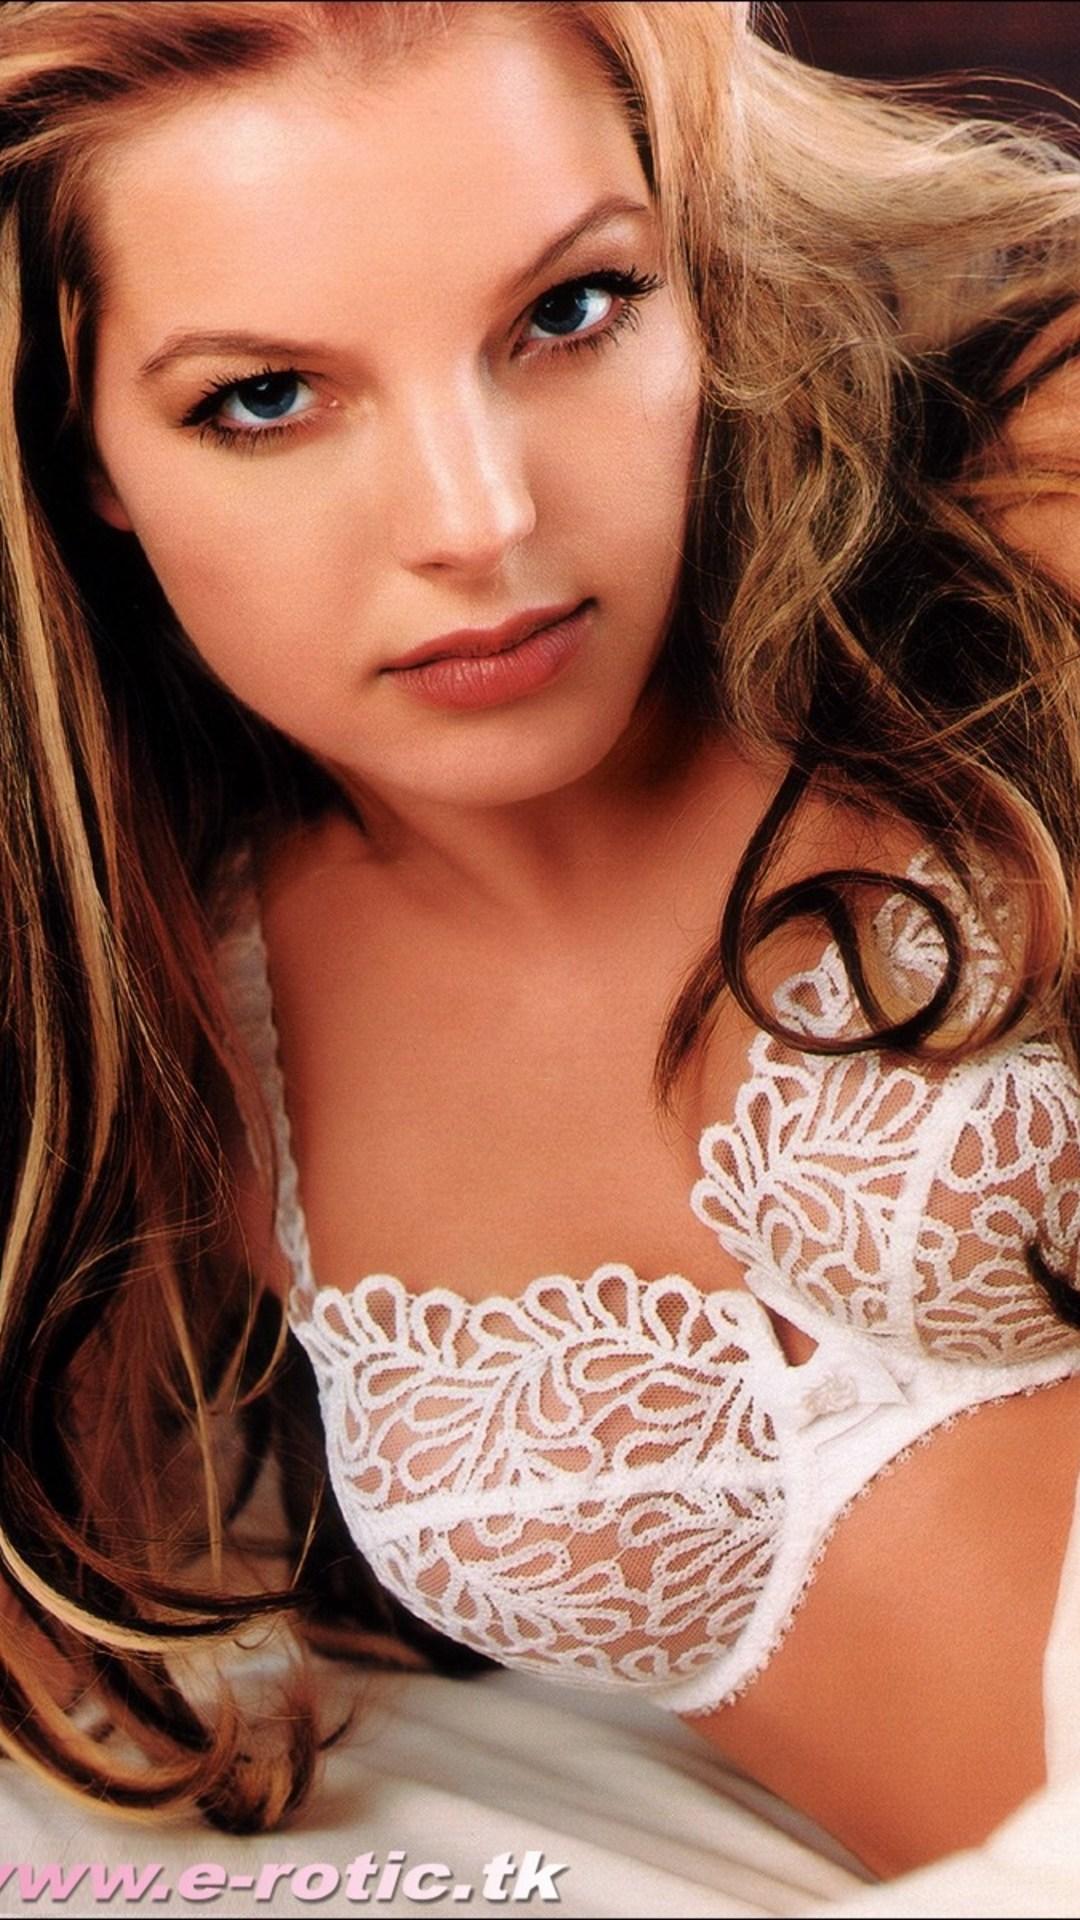 Yvonne Catterfeld Gzsz 05 Nackt Playboy Fhm Maxim on net